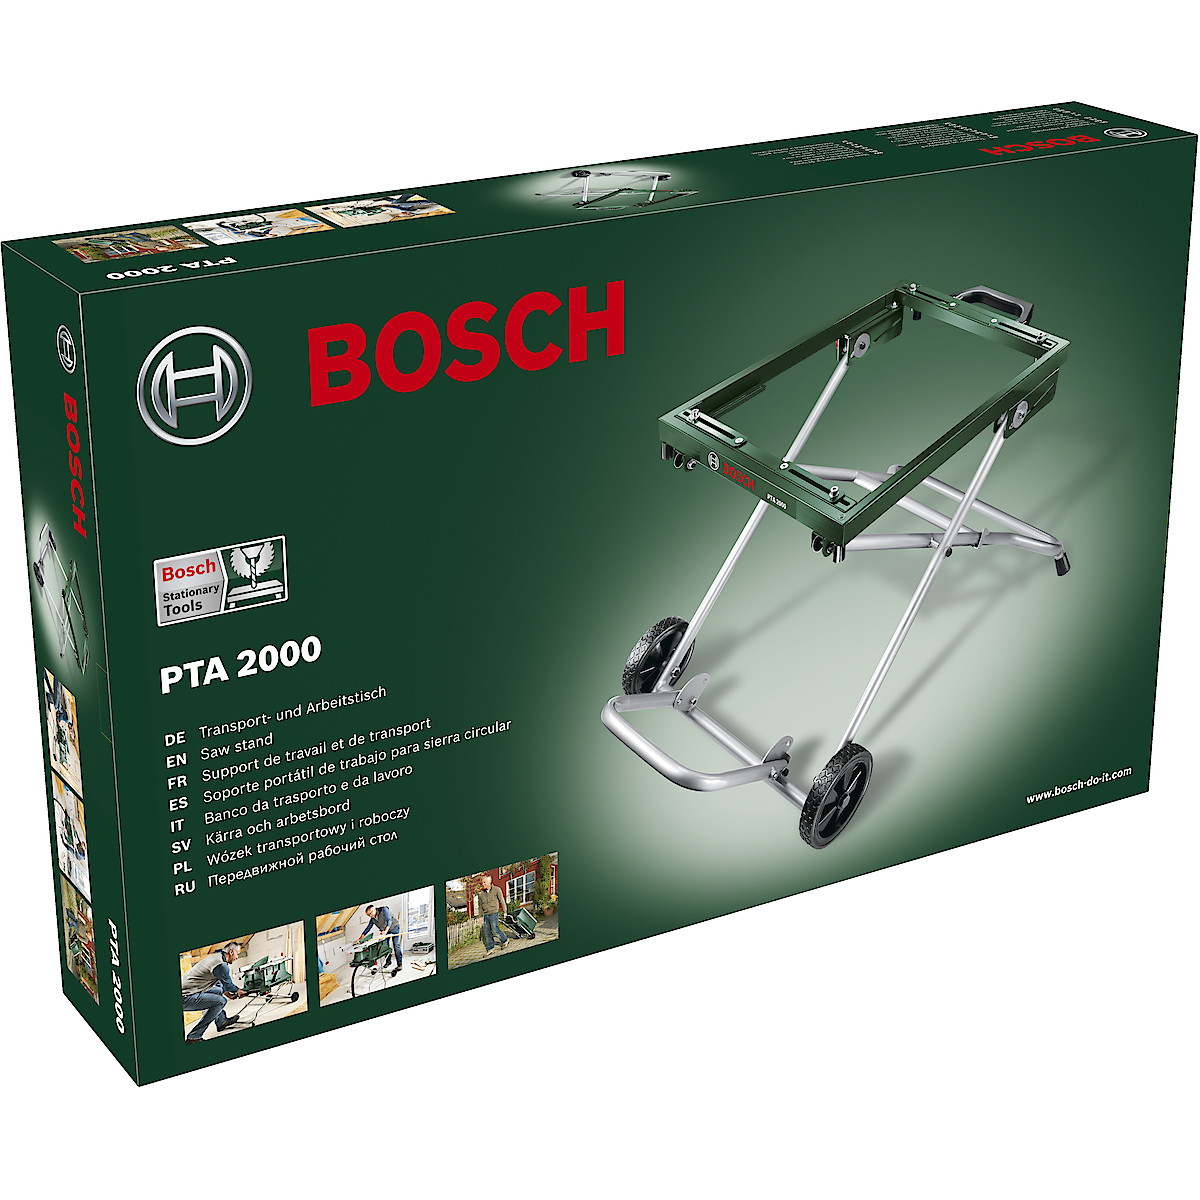 Sahausteline Bosch PTA 2000